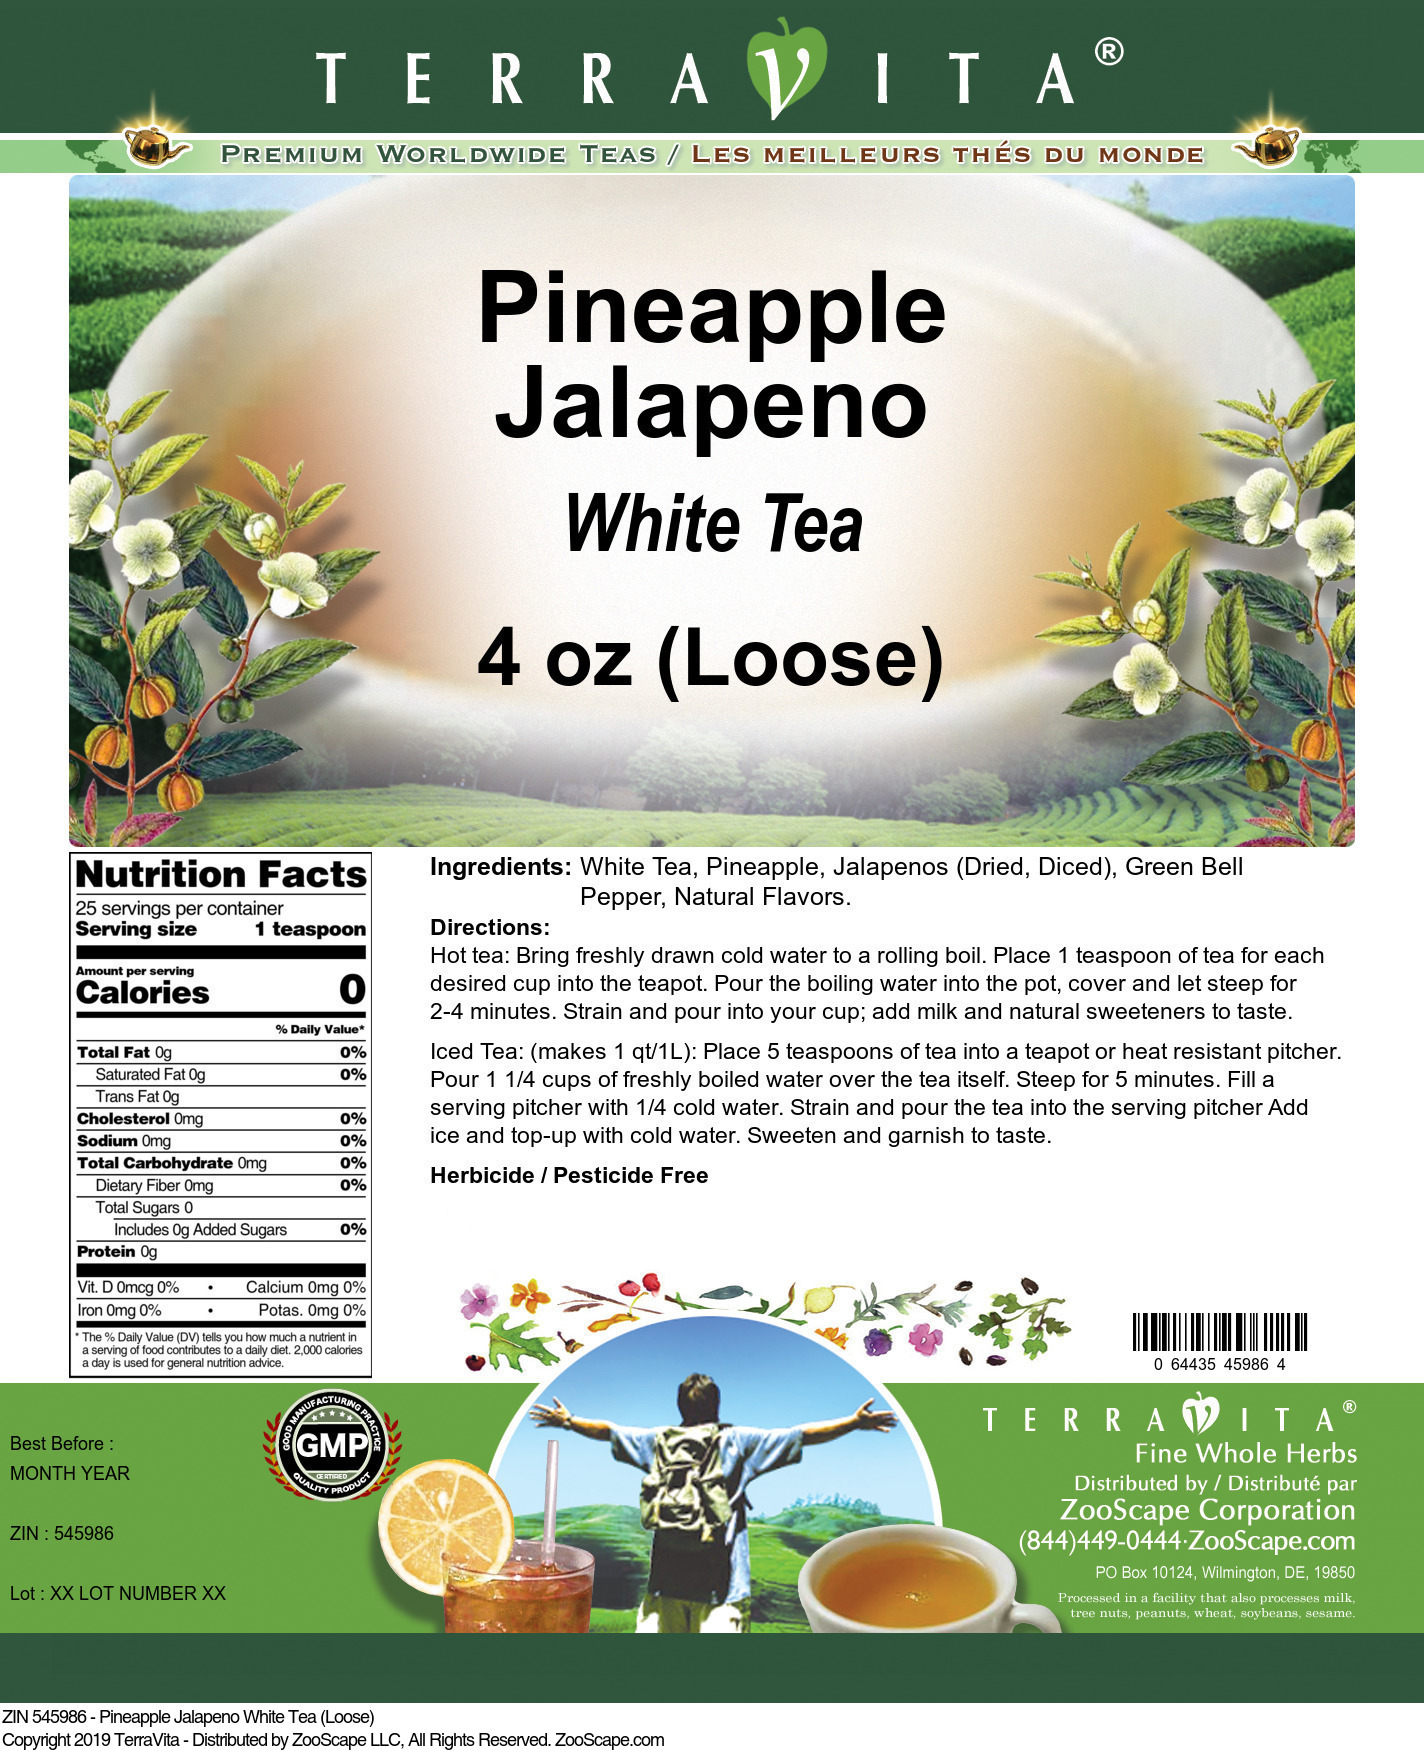 Pineapple Jalapeno White Tea (Loose)